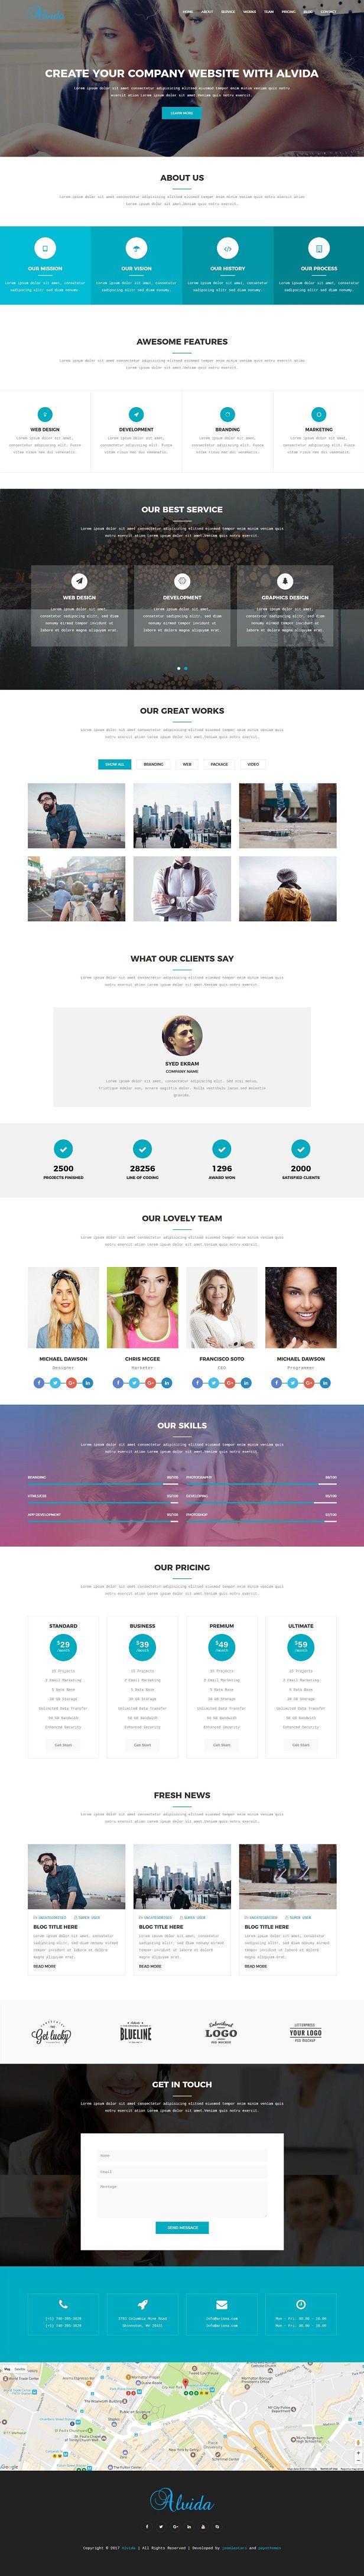 Alvida - One Page Business Joomla Theme  #joomla #theme #template #themeforest #envato #windstripethemes #business #onepage